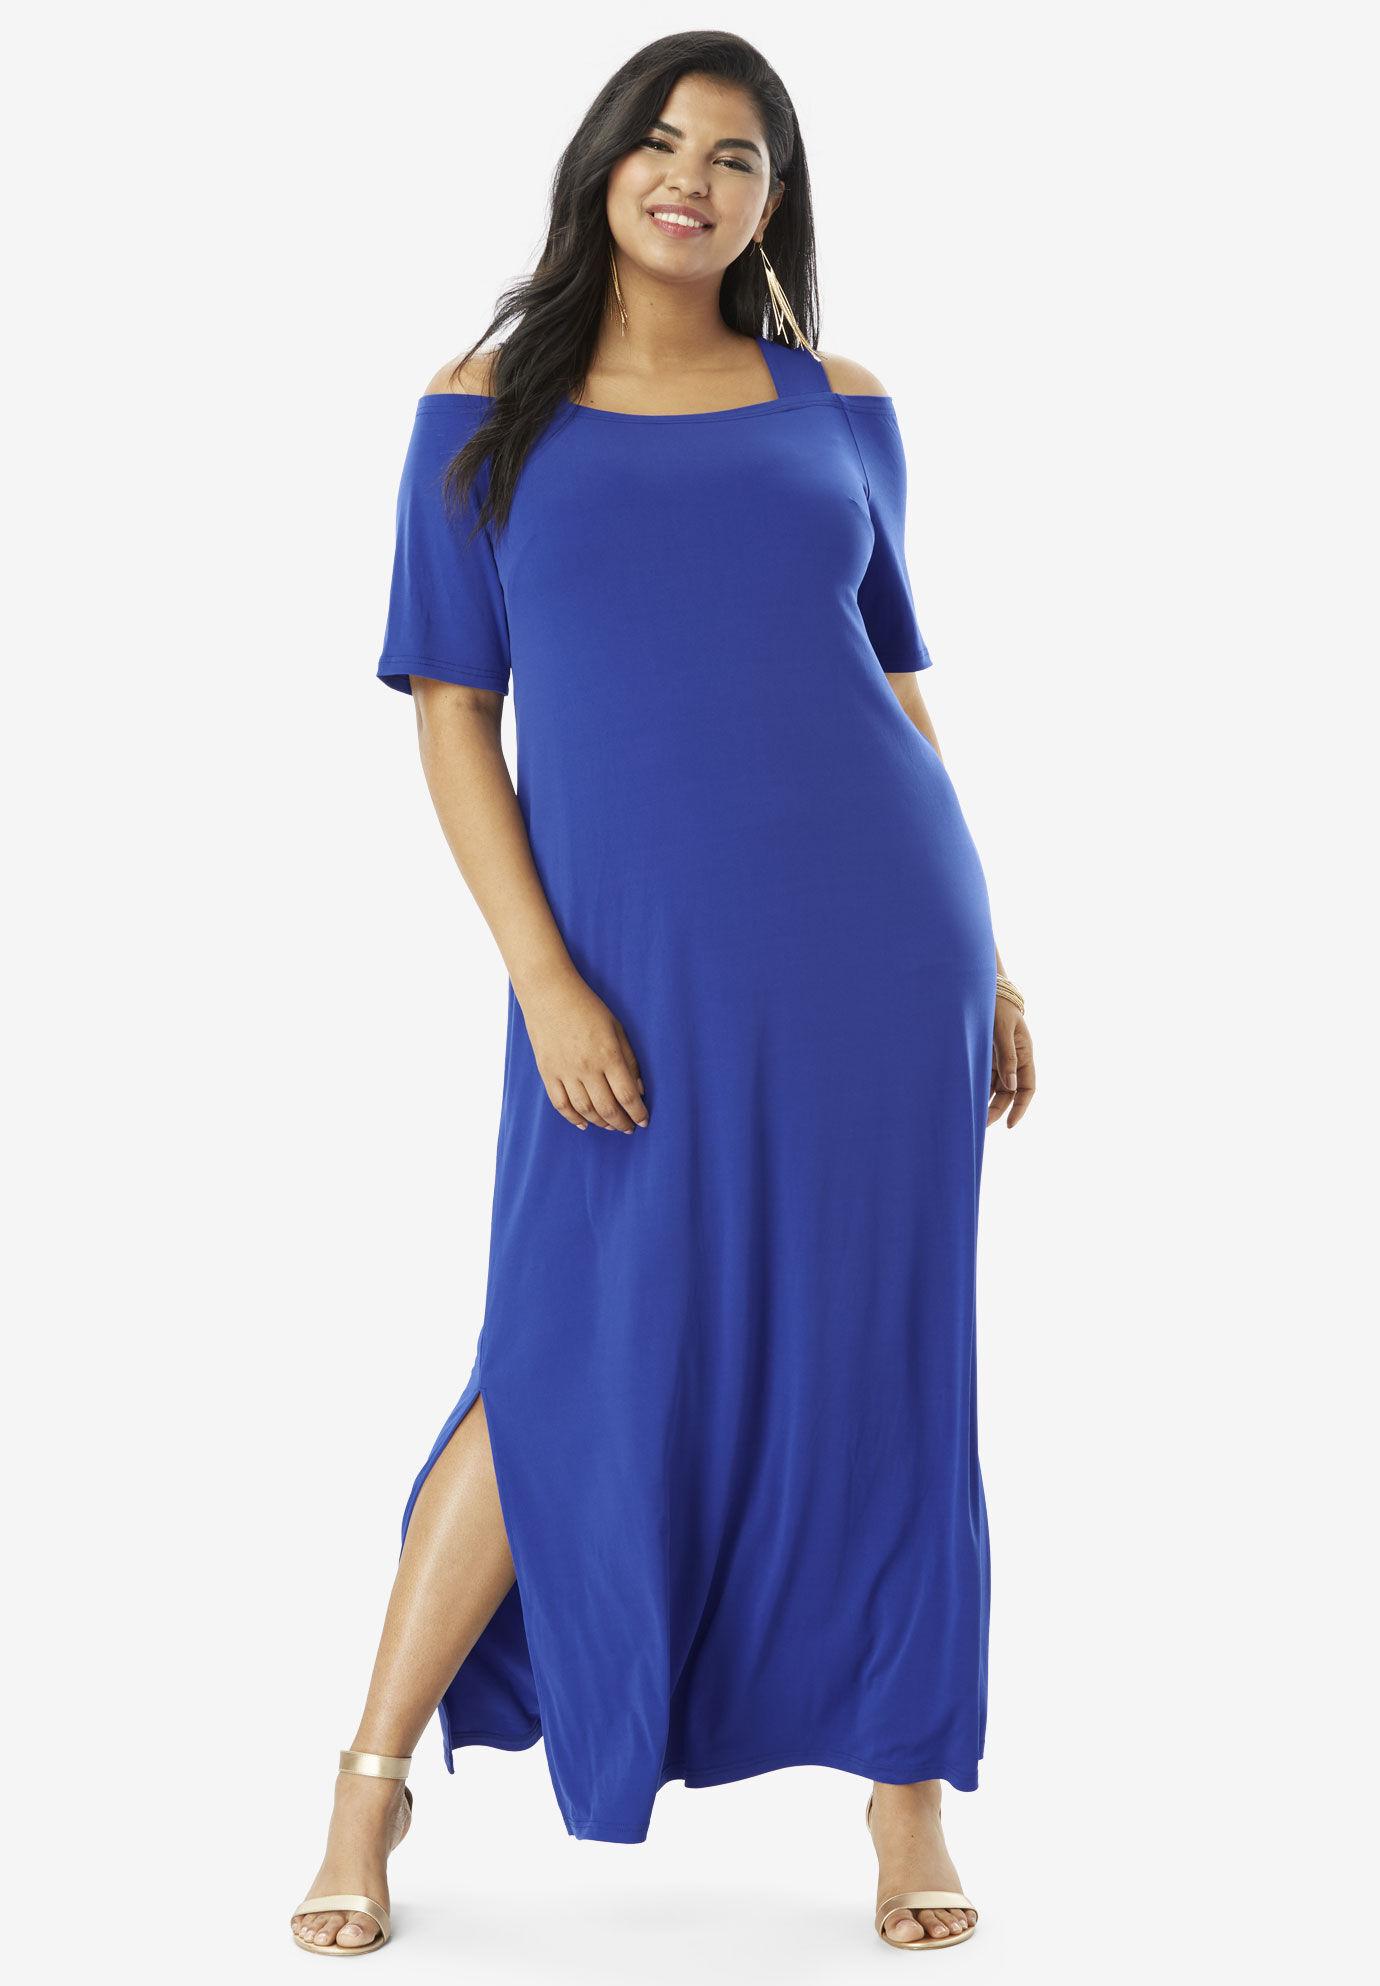 Semi Formal Plus Size Dresses